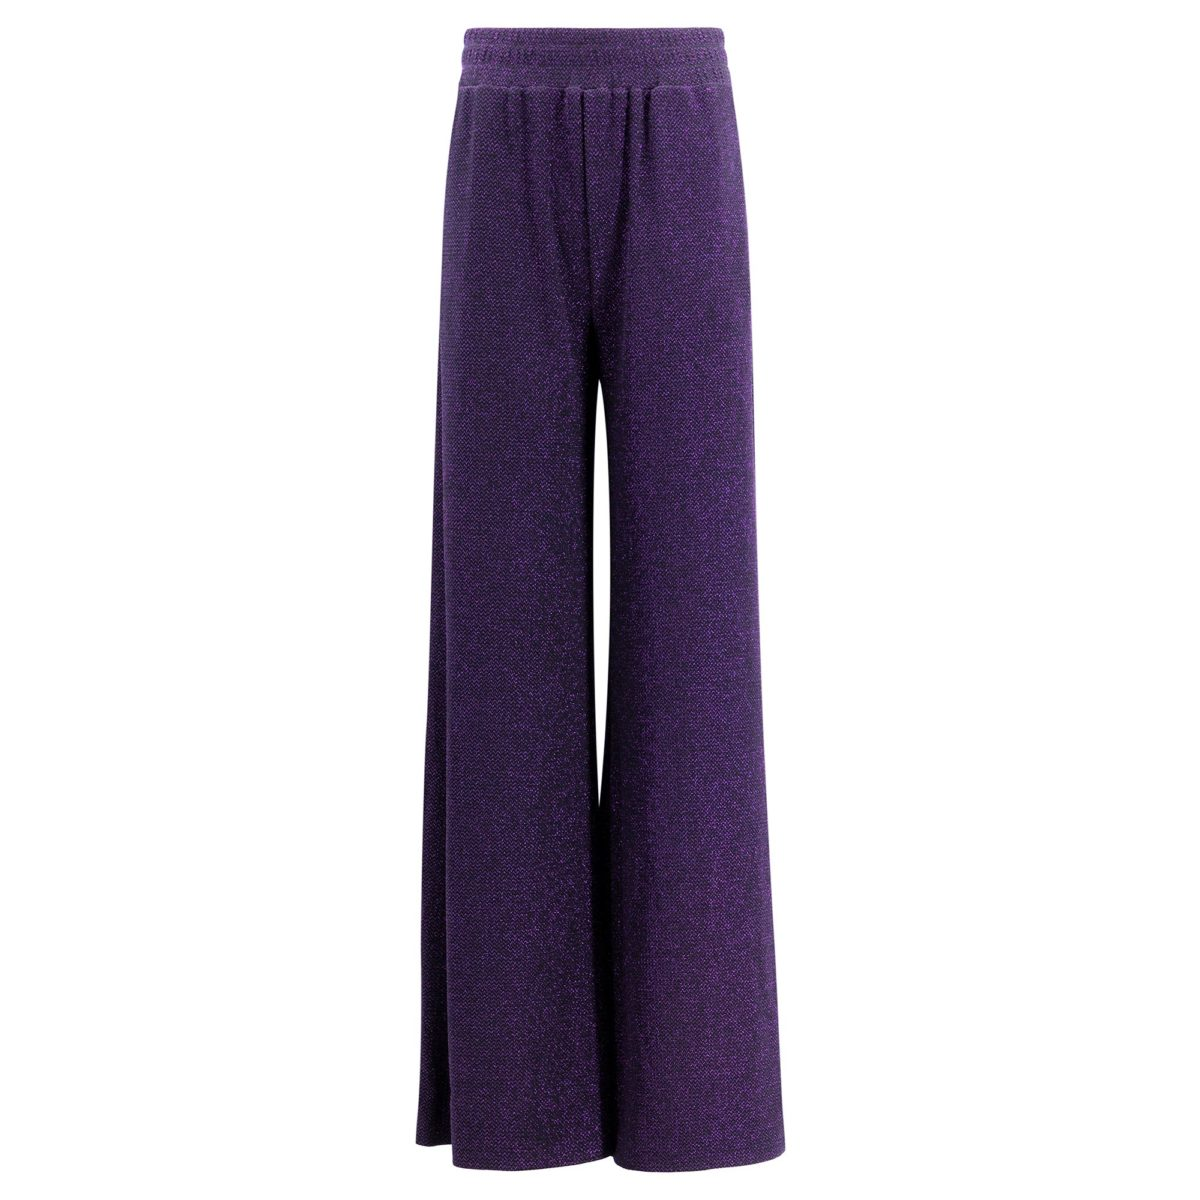 Pantalone Palazzo in lurex Viola - vista frontale | Nicla